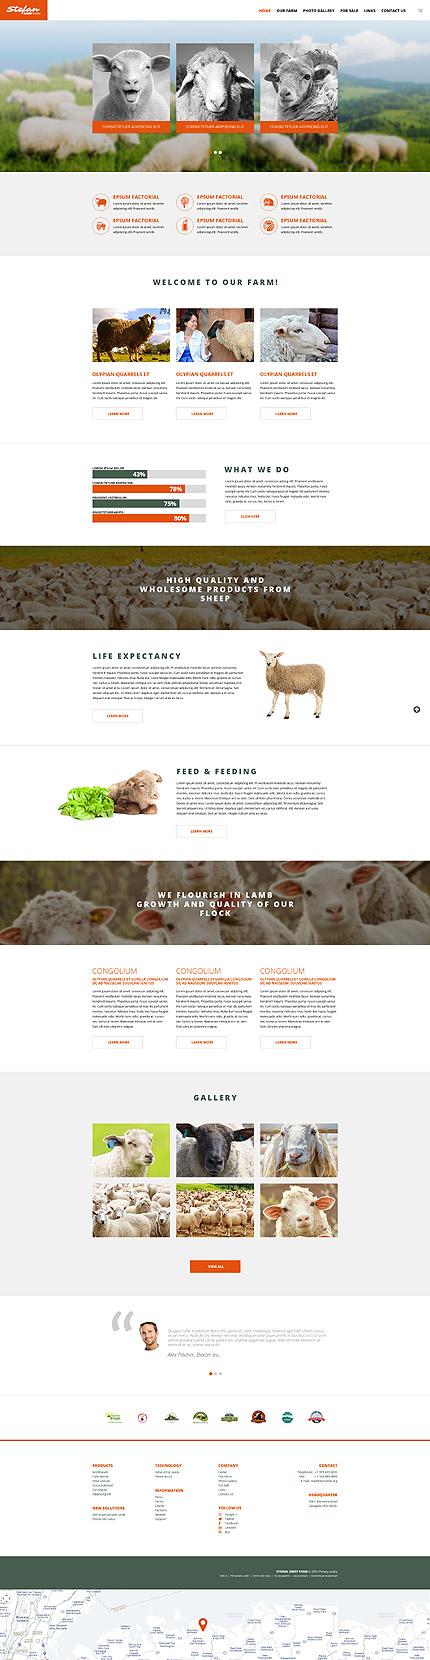 Sablon de | Agricultura | ID: 2452